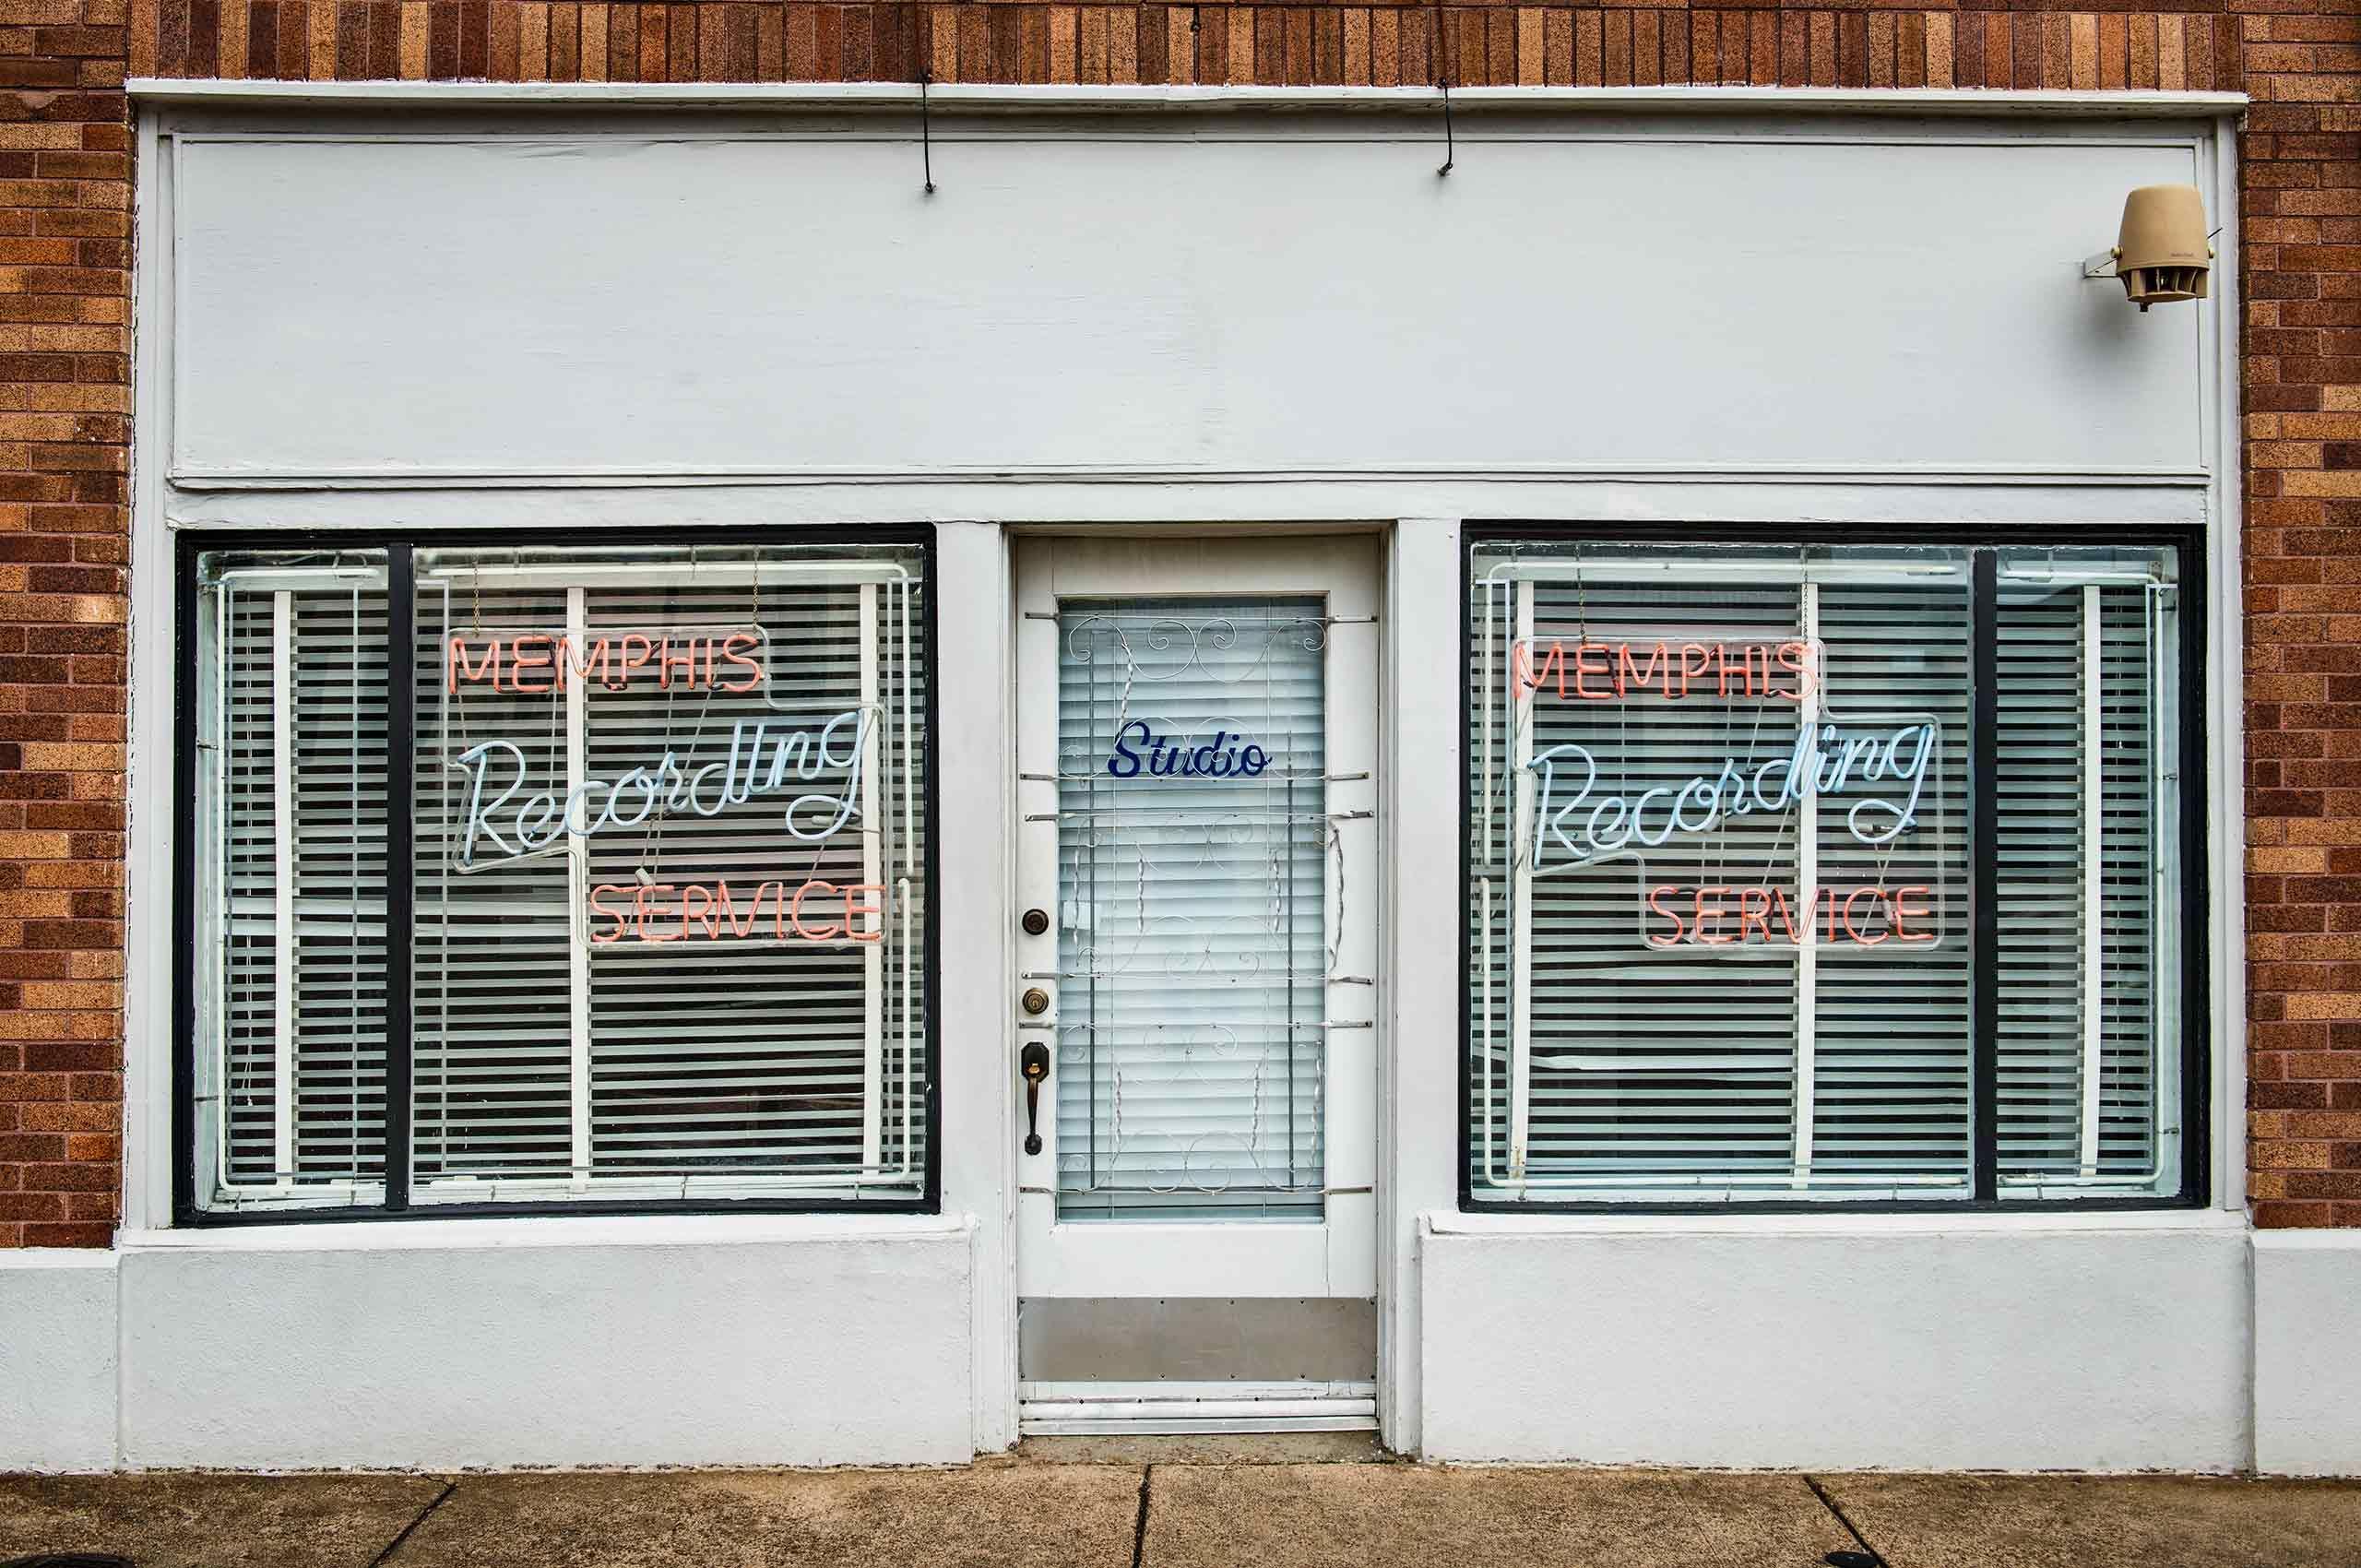 Recordingstudio-SunStudio-Memphis-by-HenrikOlundPhotography.jpg